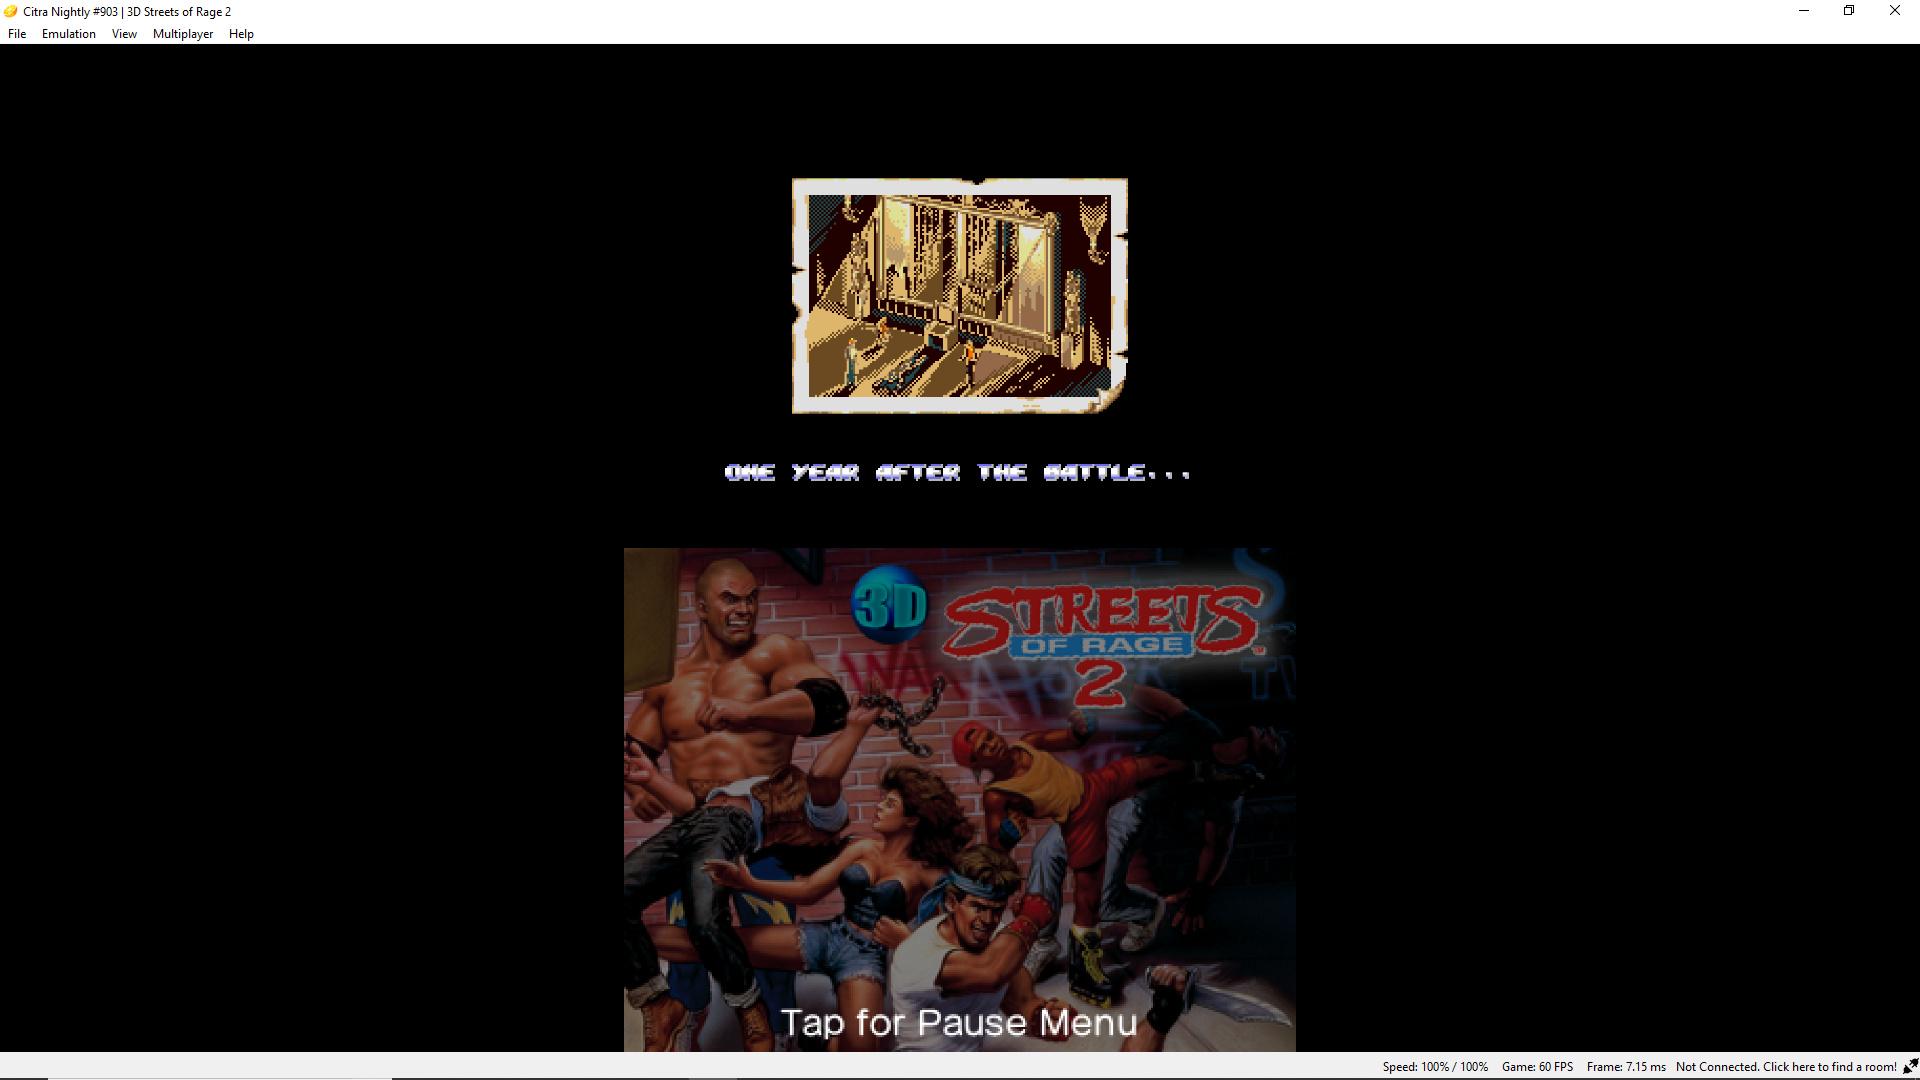 Sega 3d classics games like streets of rage and shinobi III